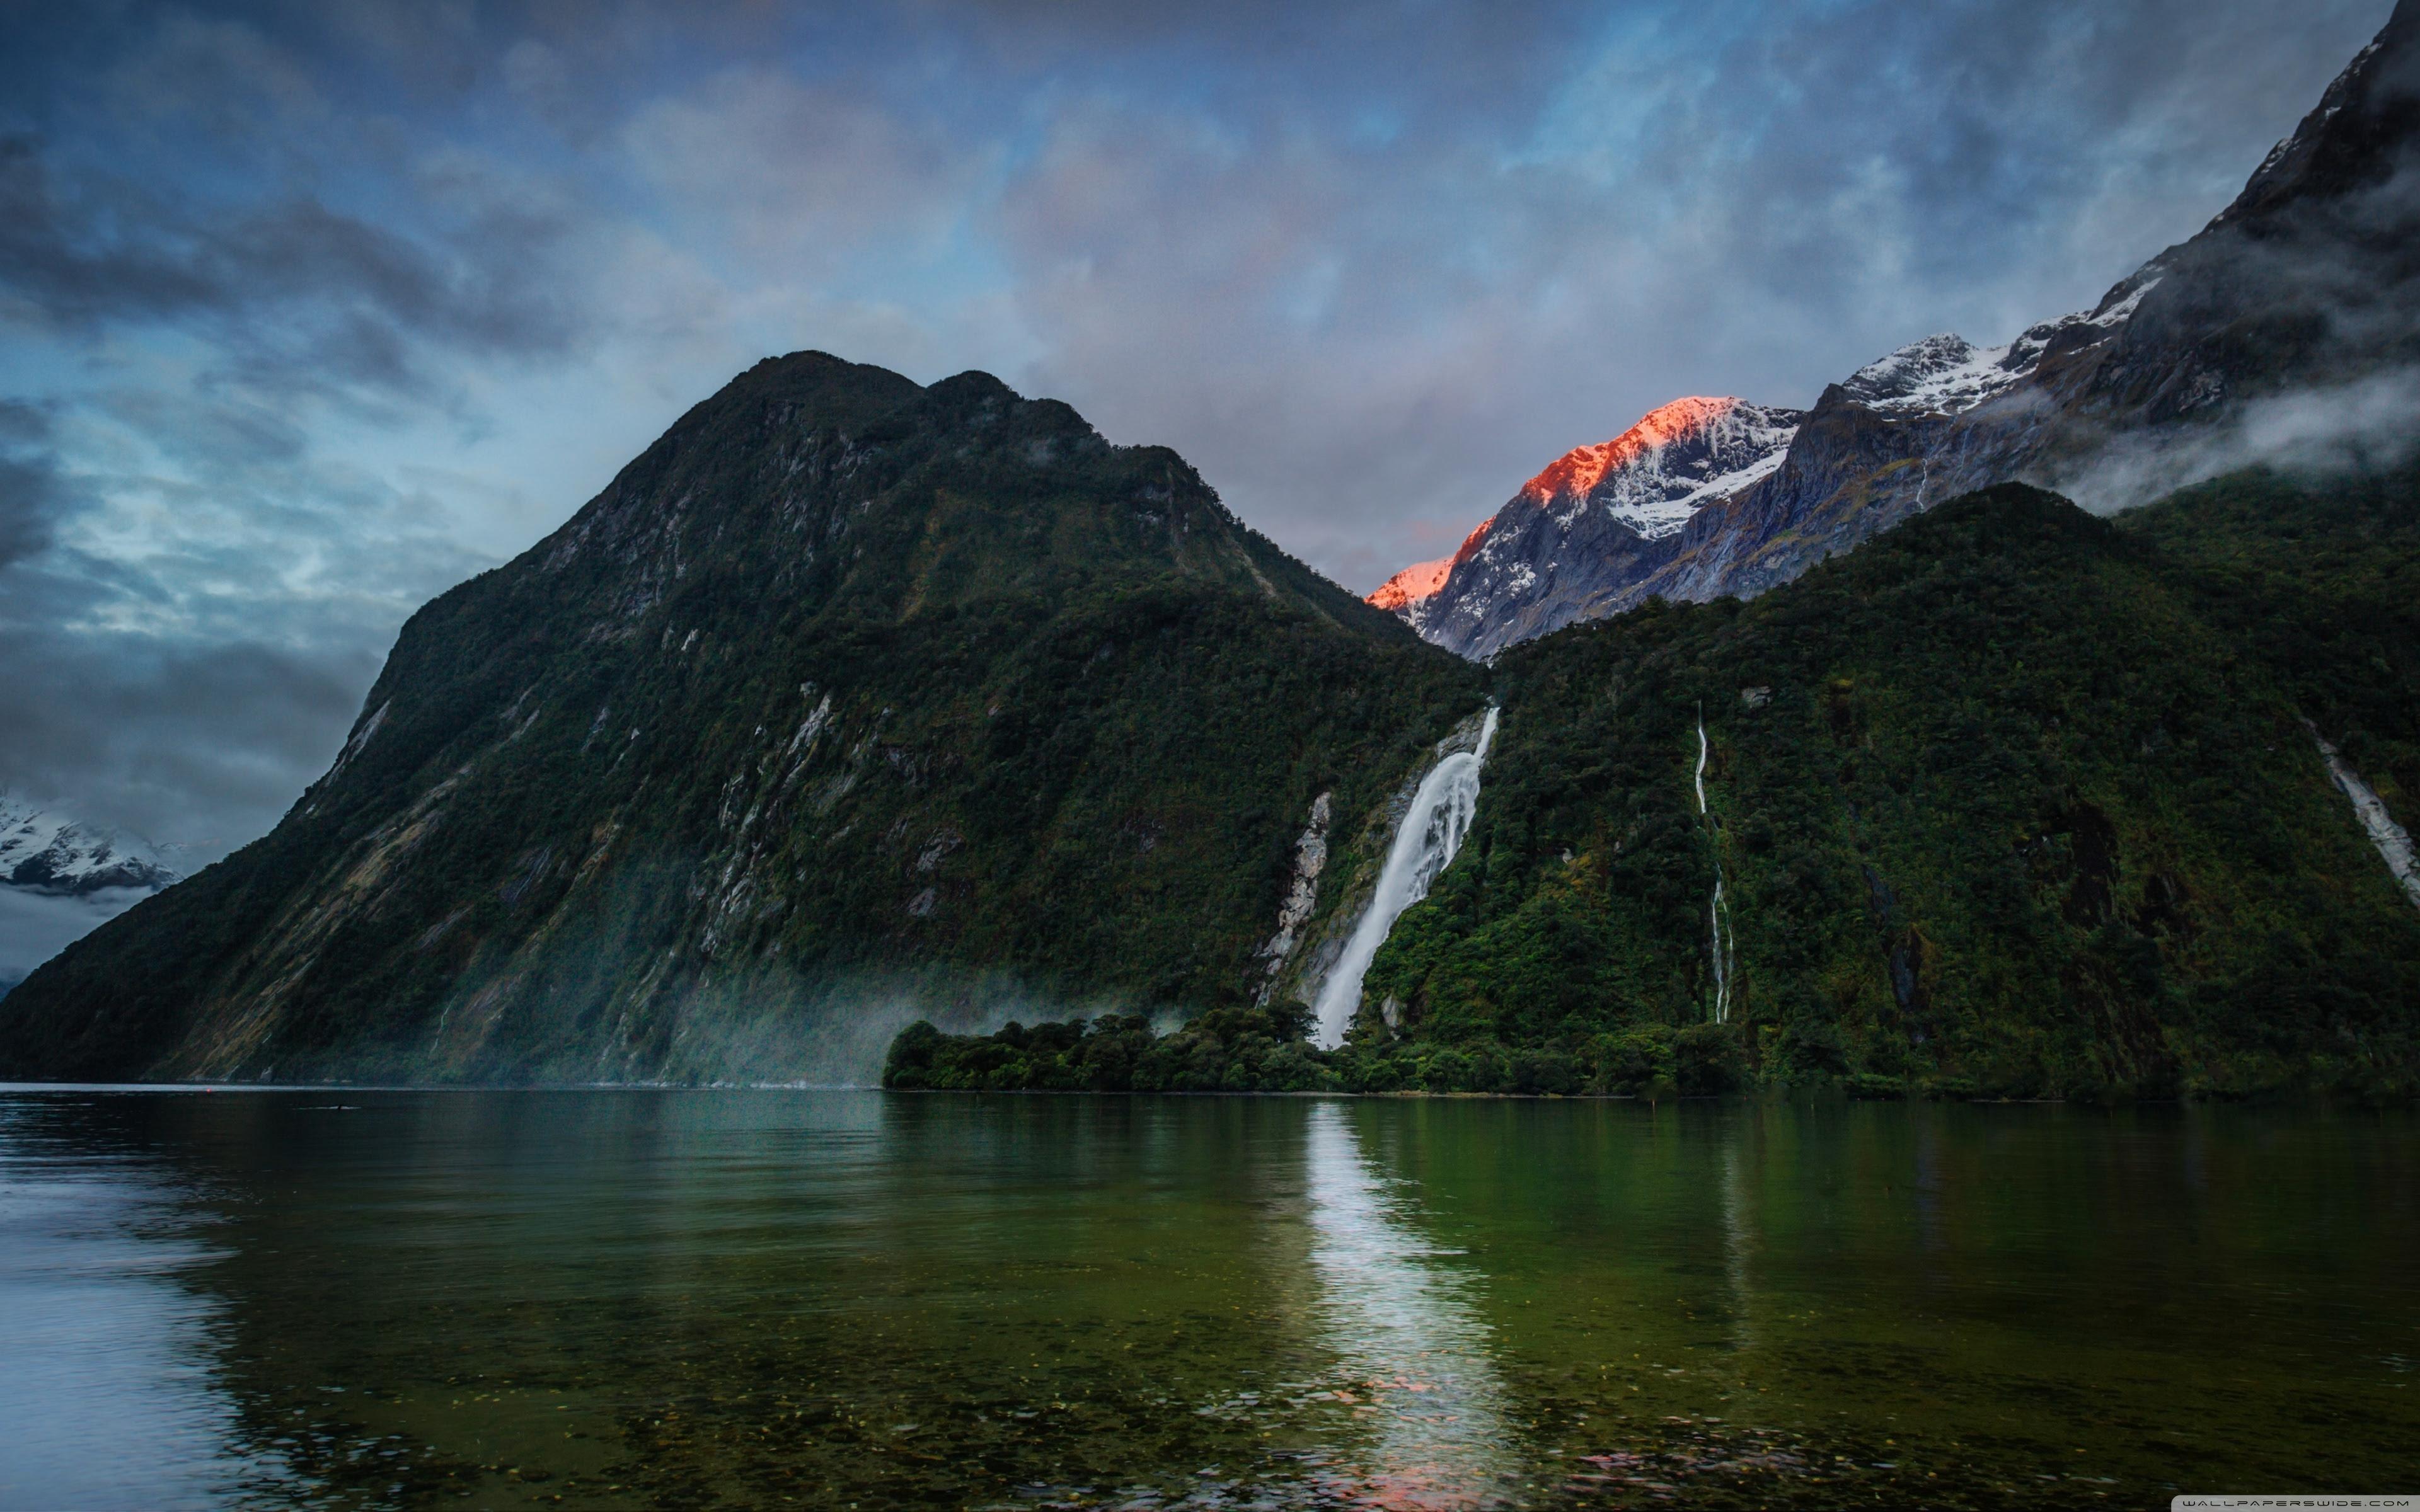 New Zealand Wallpaper 3840x2400 68742